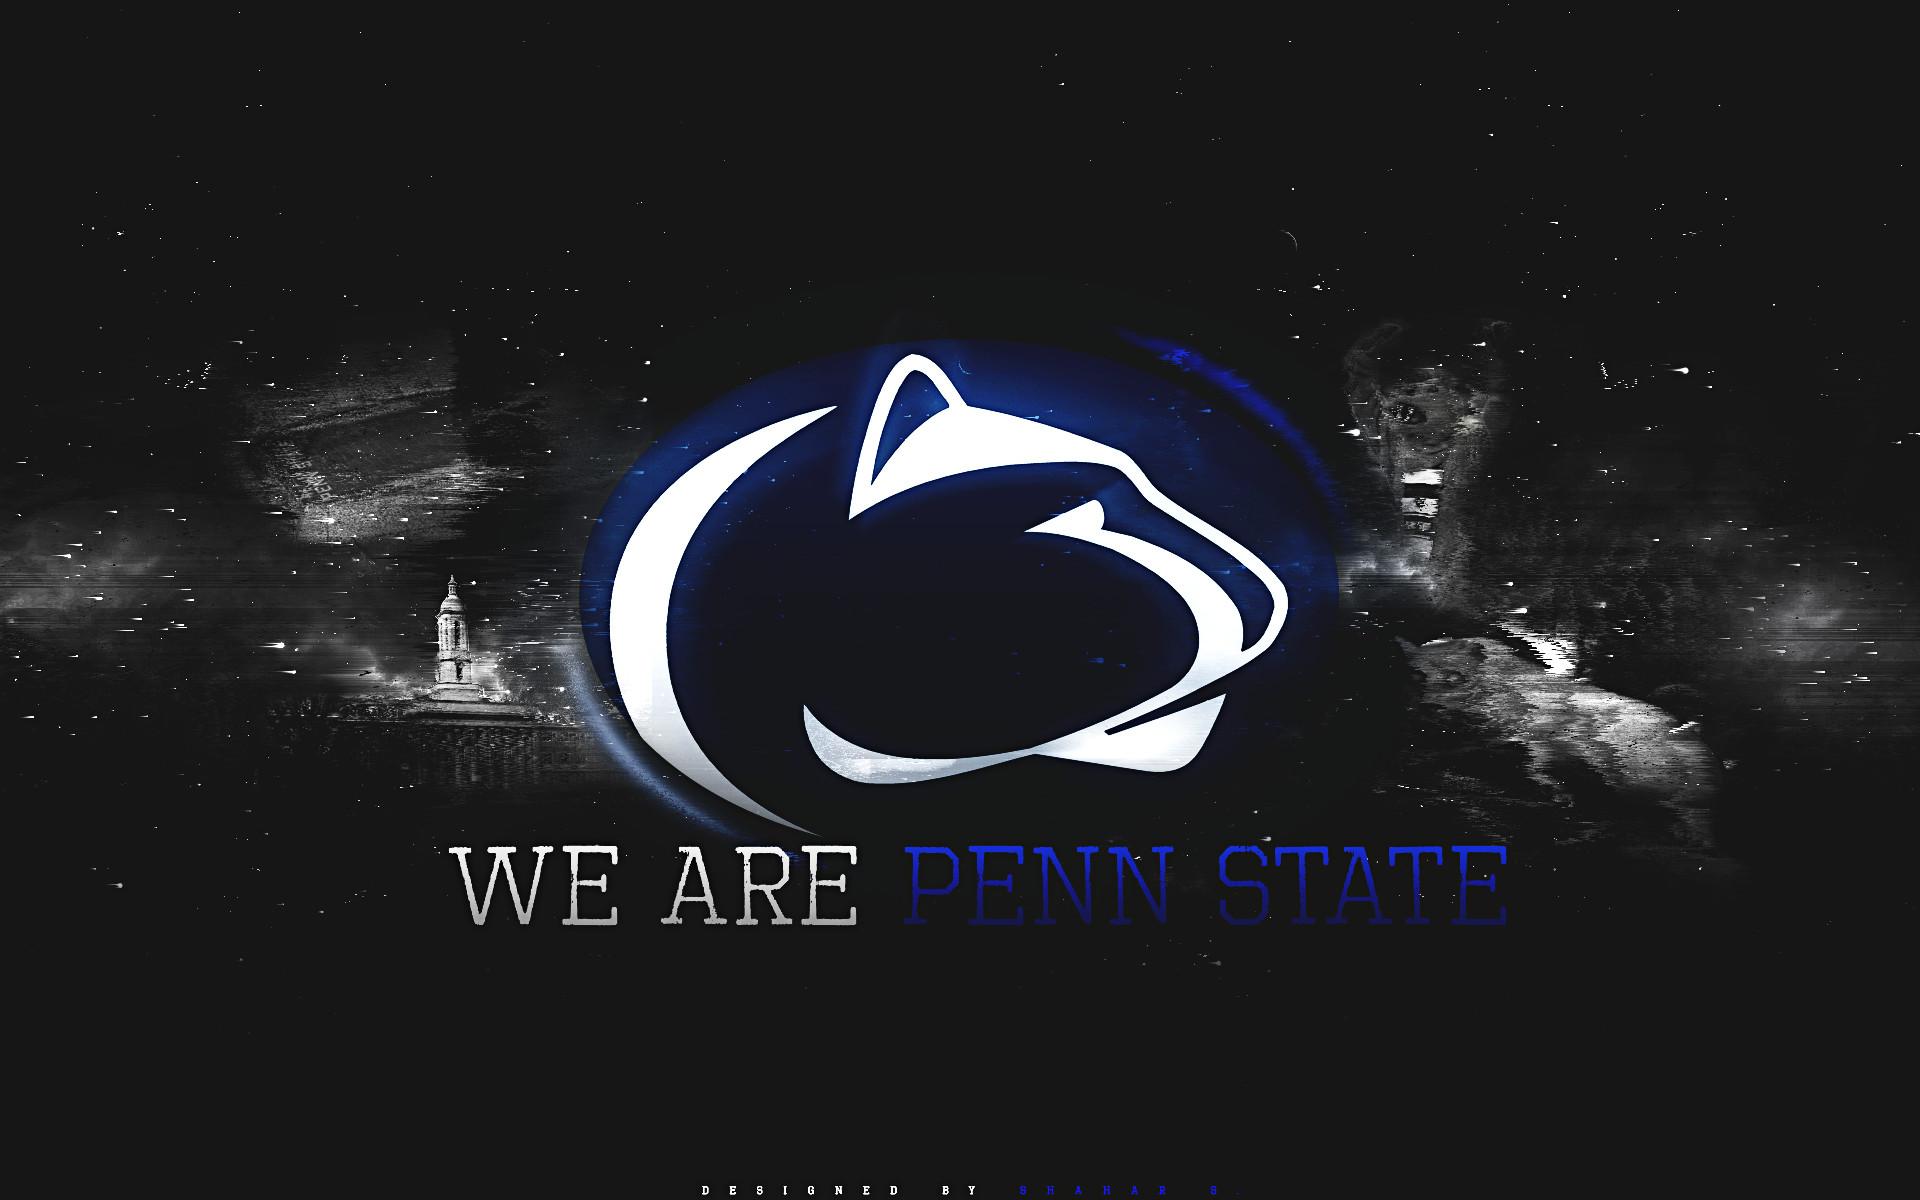 Download Free Penn State Wallpapers – wallpaper.wiki